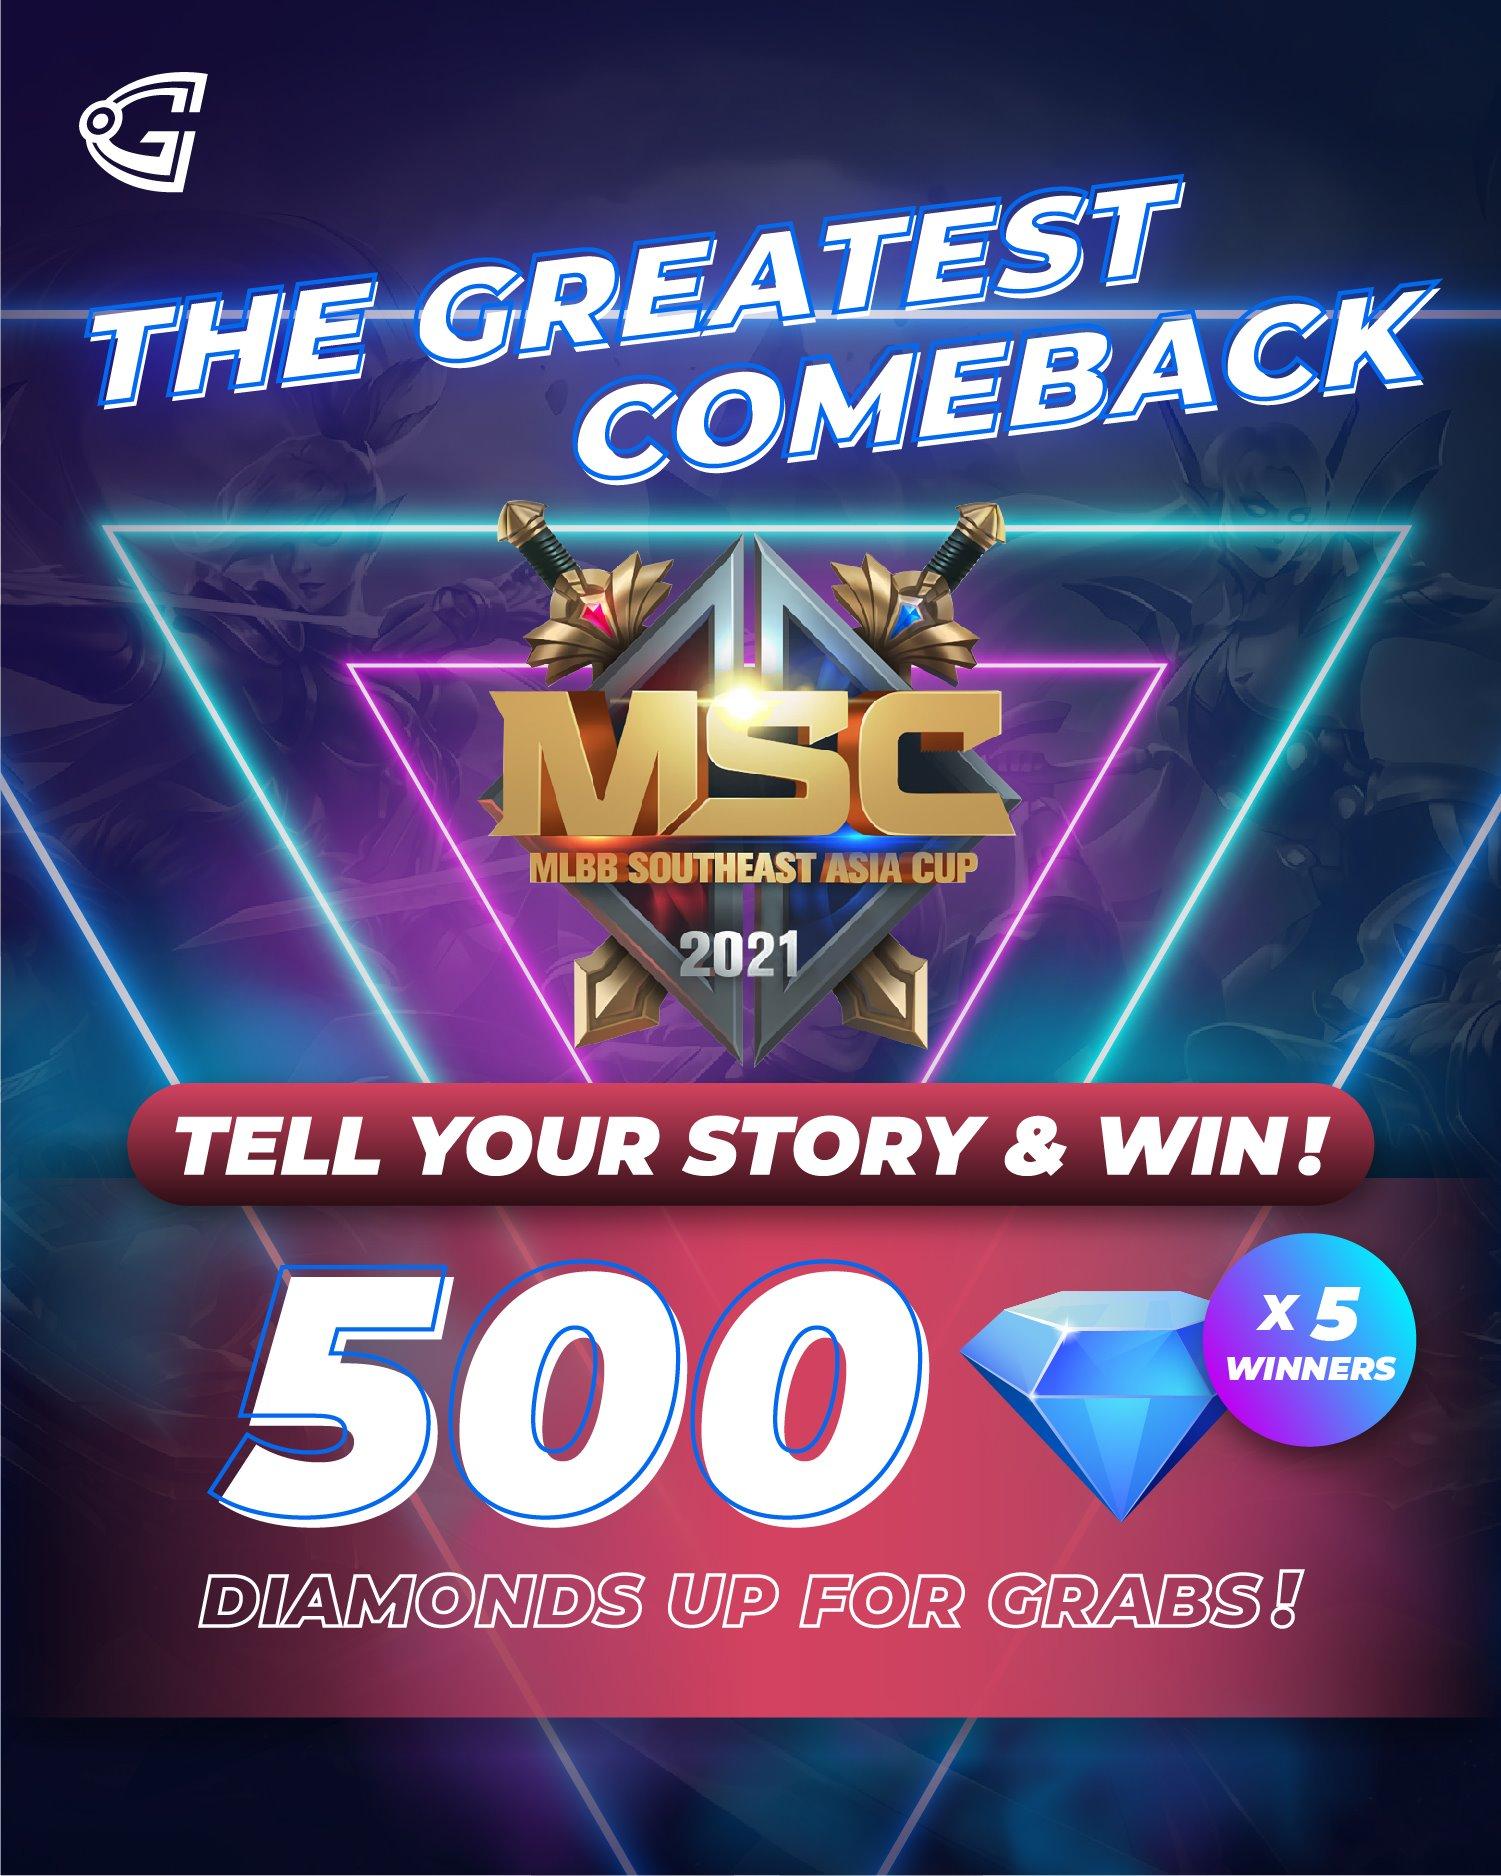 MSC 2021 Gosugamers competition